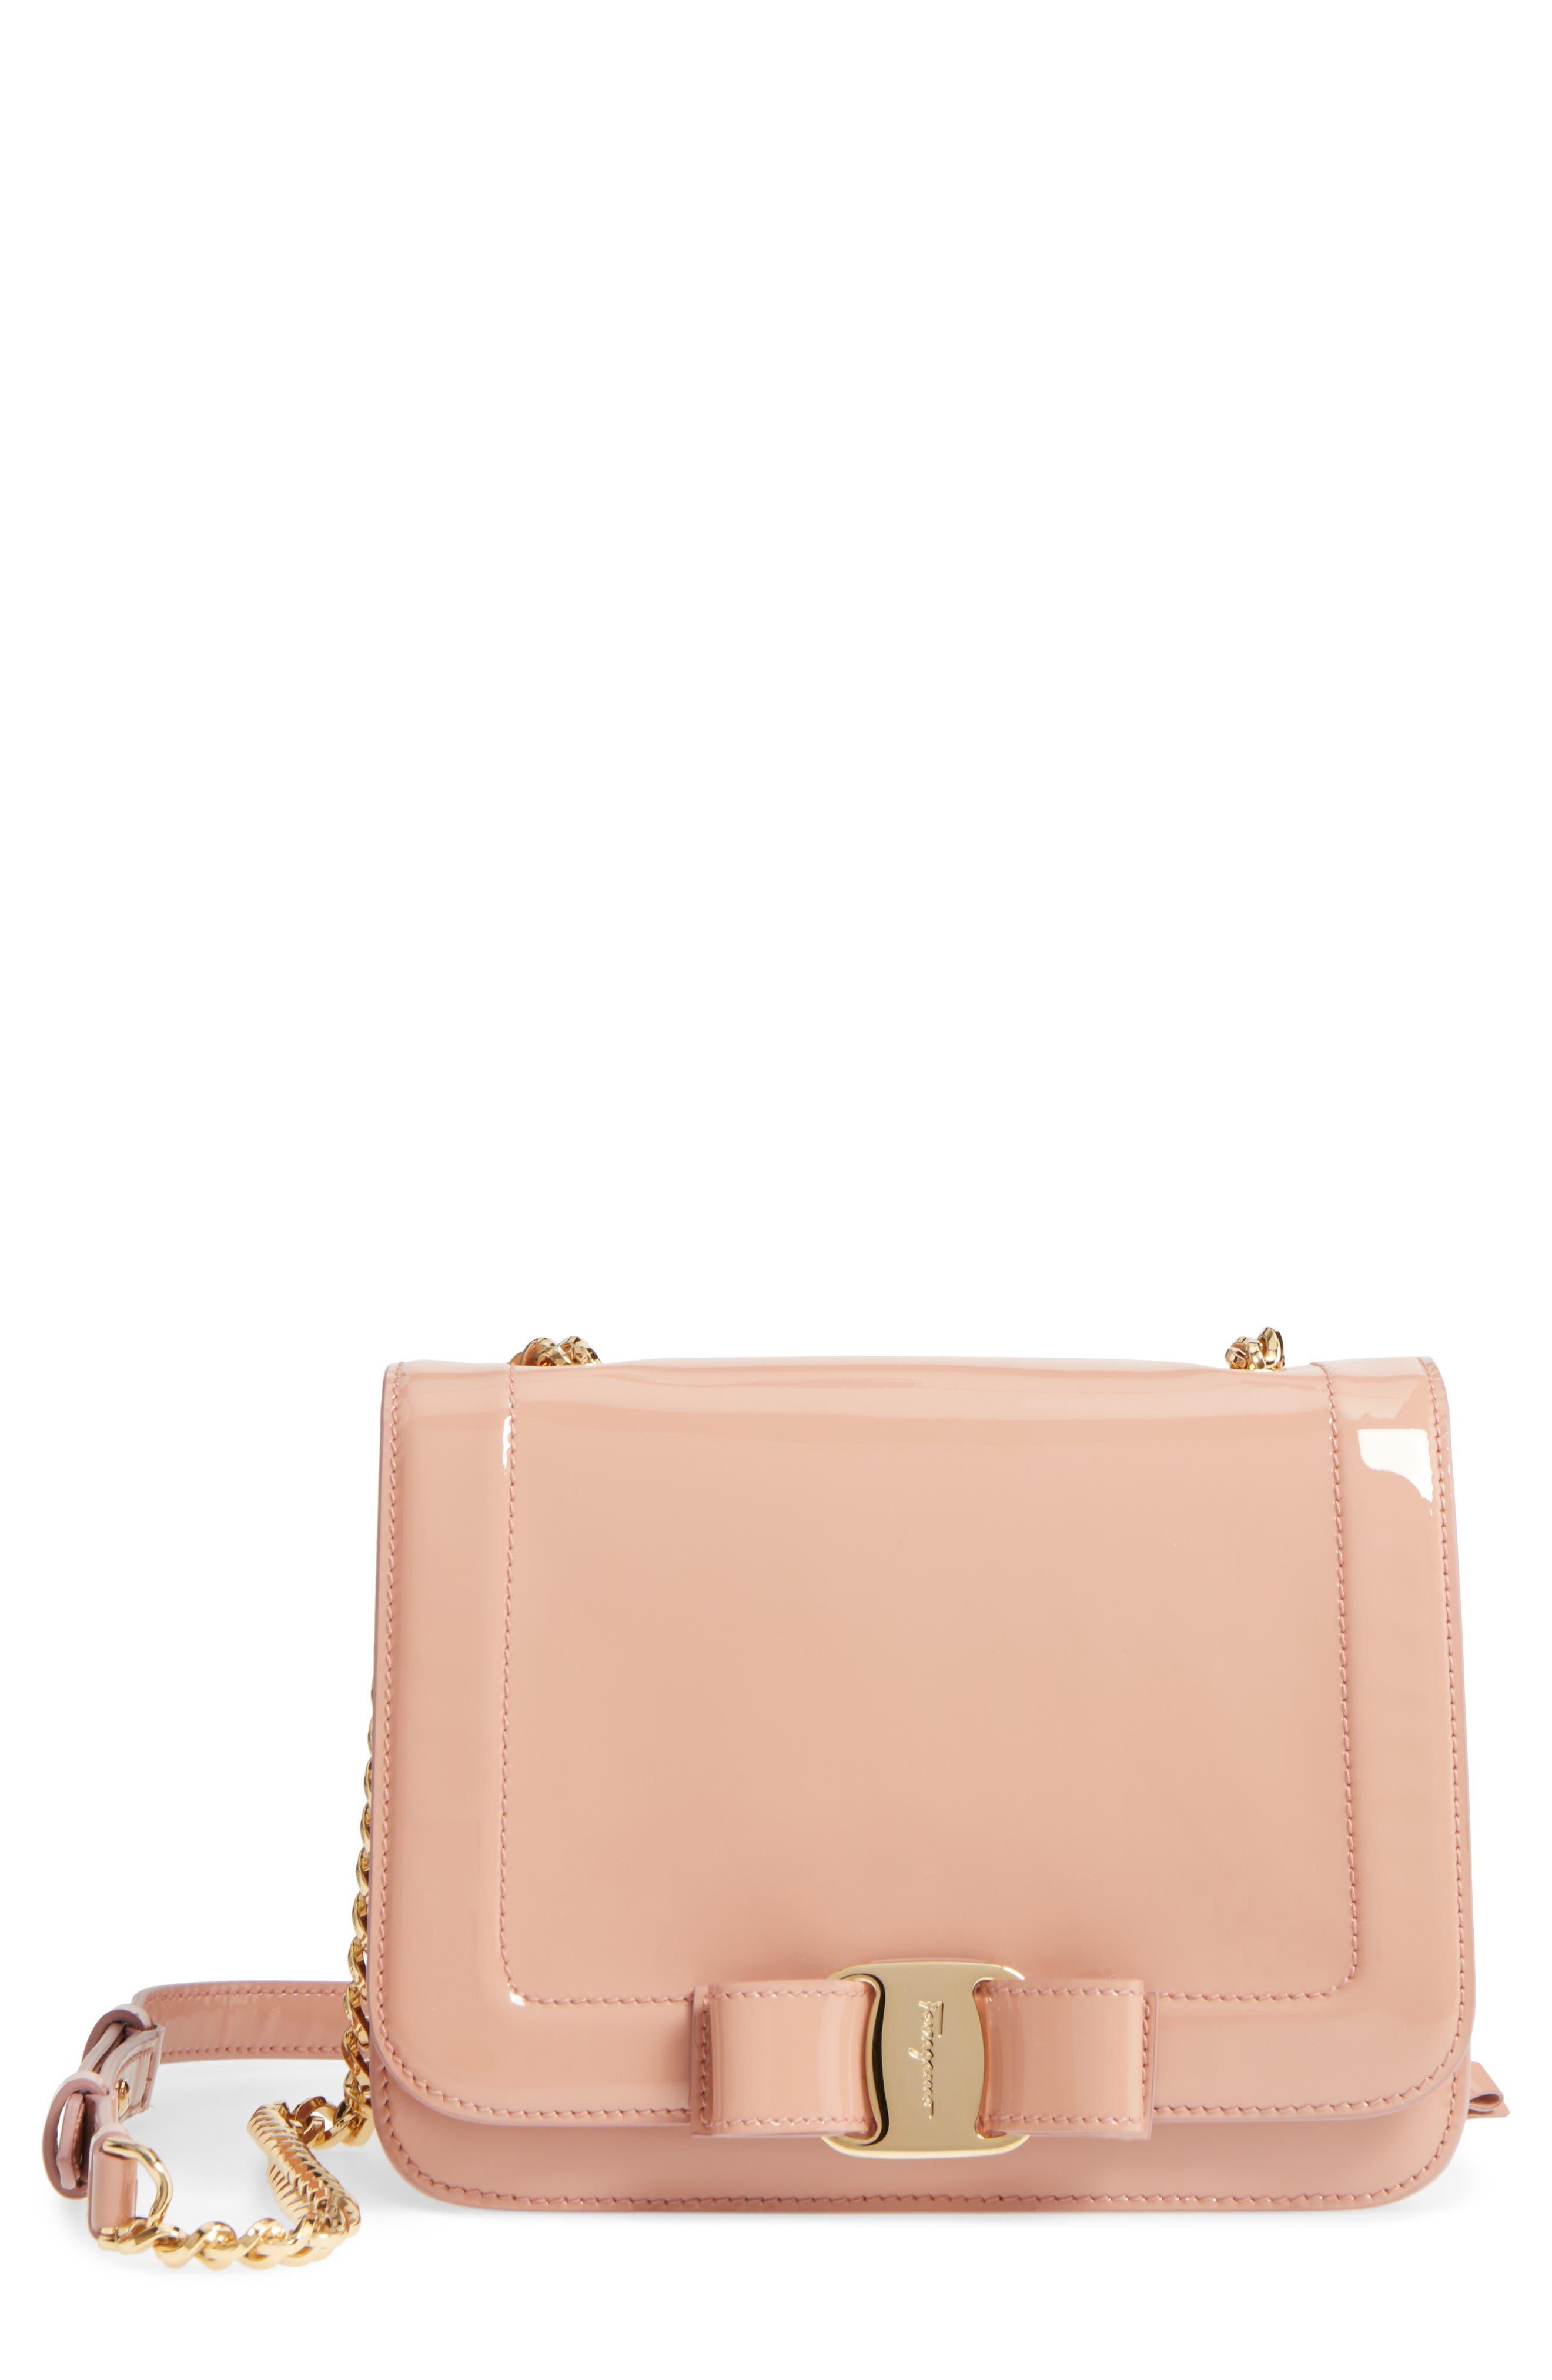 Vara Patent Leather Shoulder Bag,                             Main thumbnail 1, color,                             NEW BLUSH/ BONBON